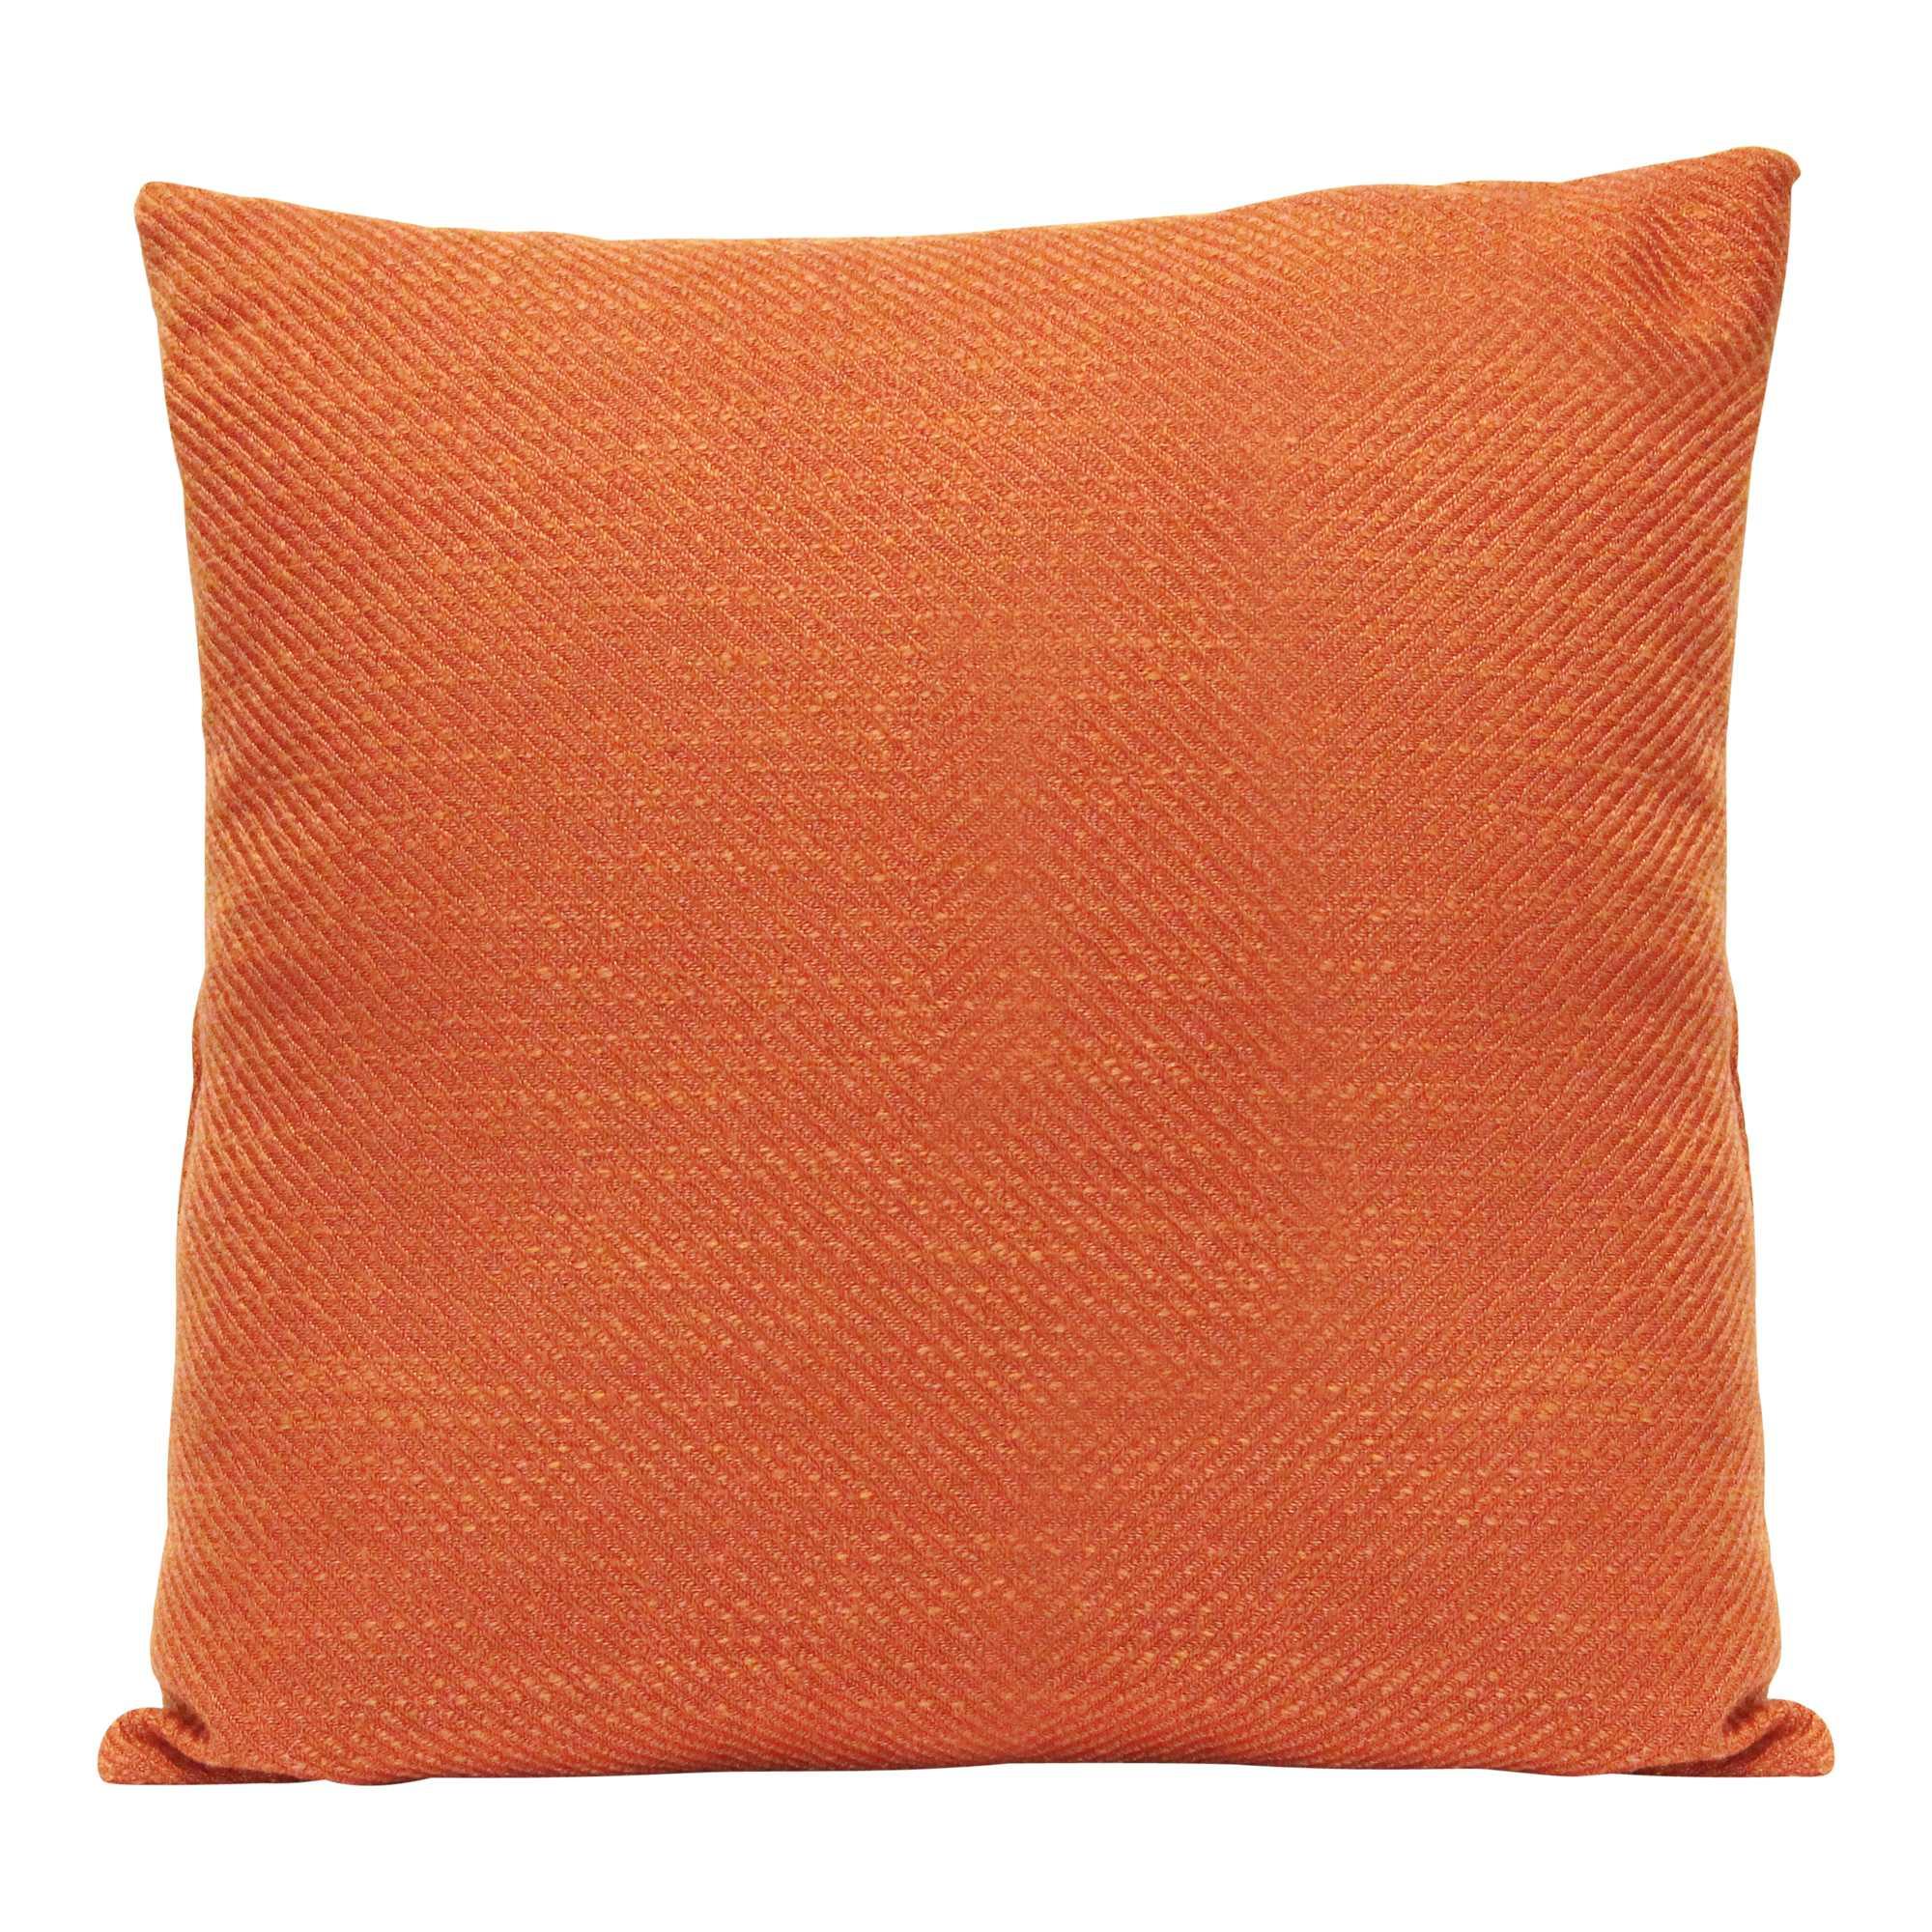 Burnt Orange Tweed Textured Velvet Square Pillow